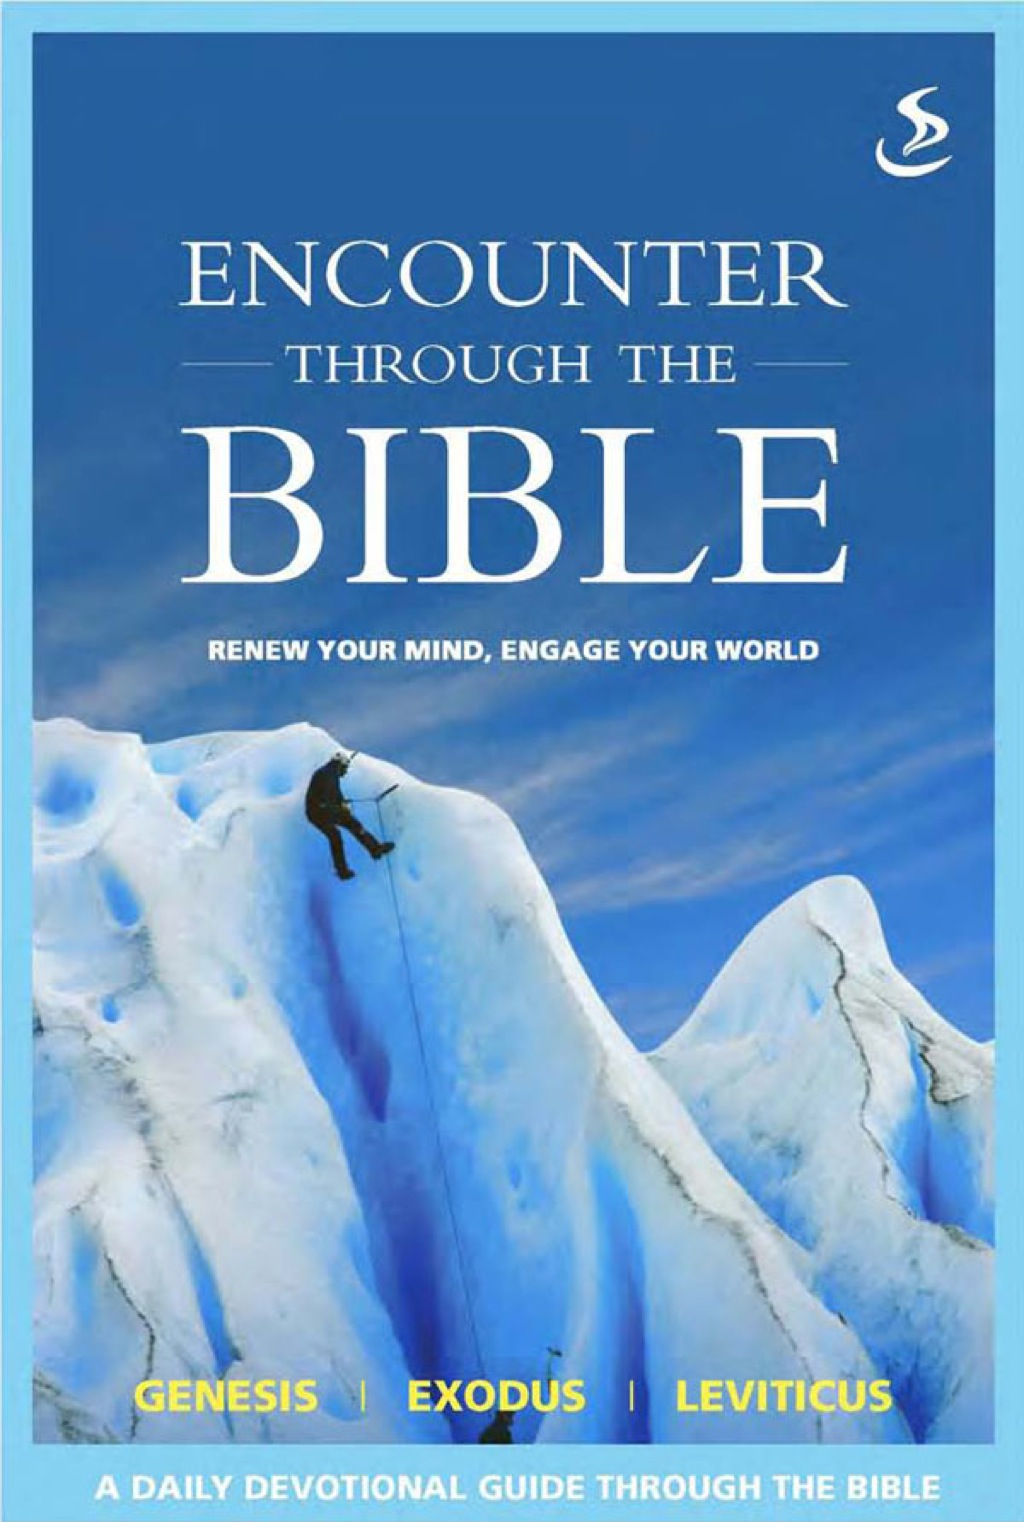 Encounter through the Bible - Genesis - Exodus - Leviticus (eBook)